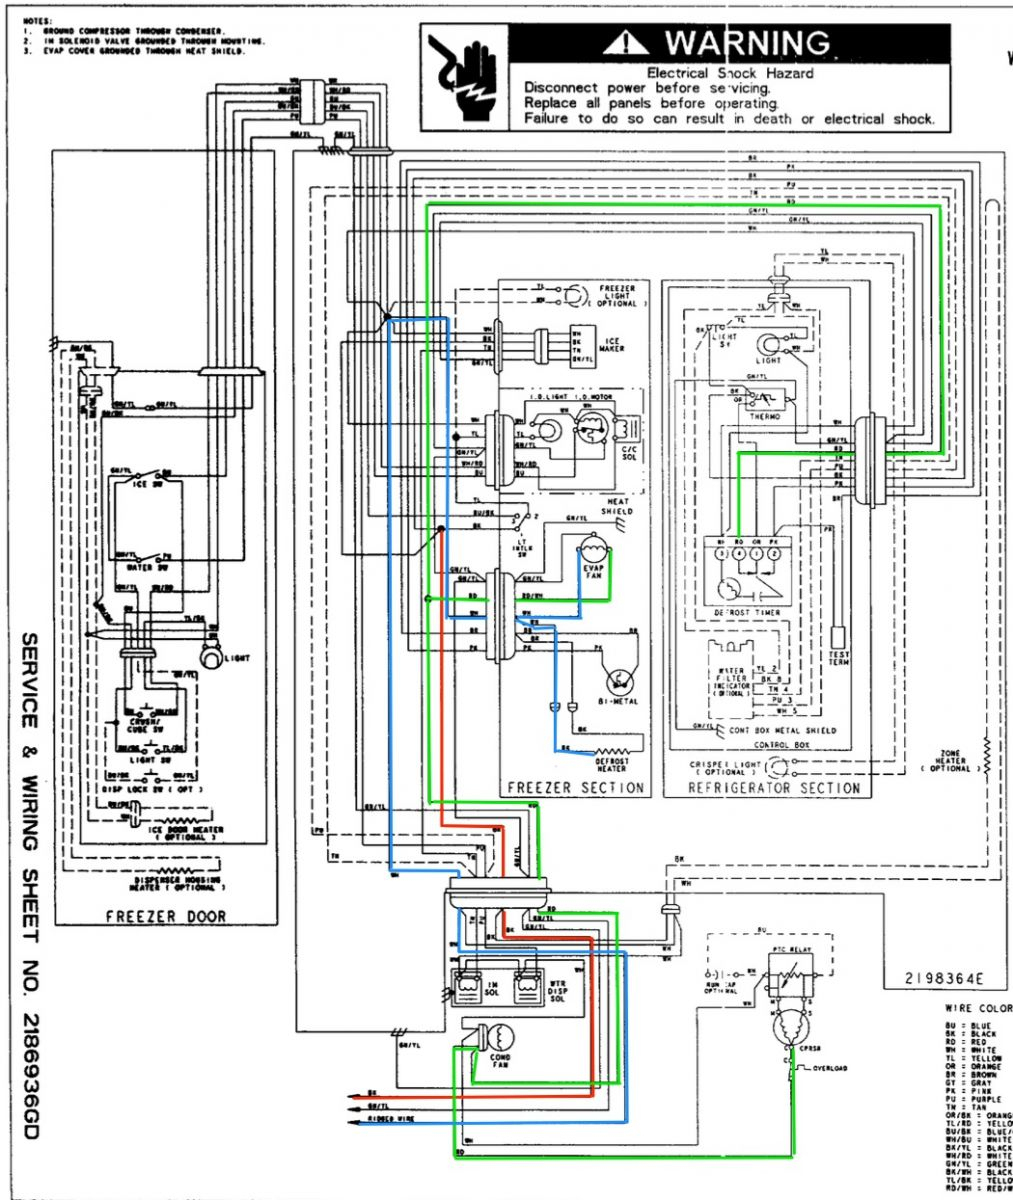 Amana Ice Maker Wiring Diagram | Schematic Diagram - Ge Refrigerator Wiring Diagram